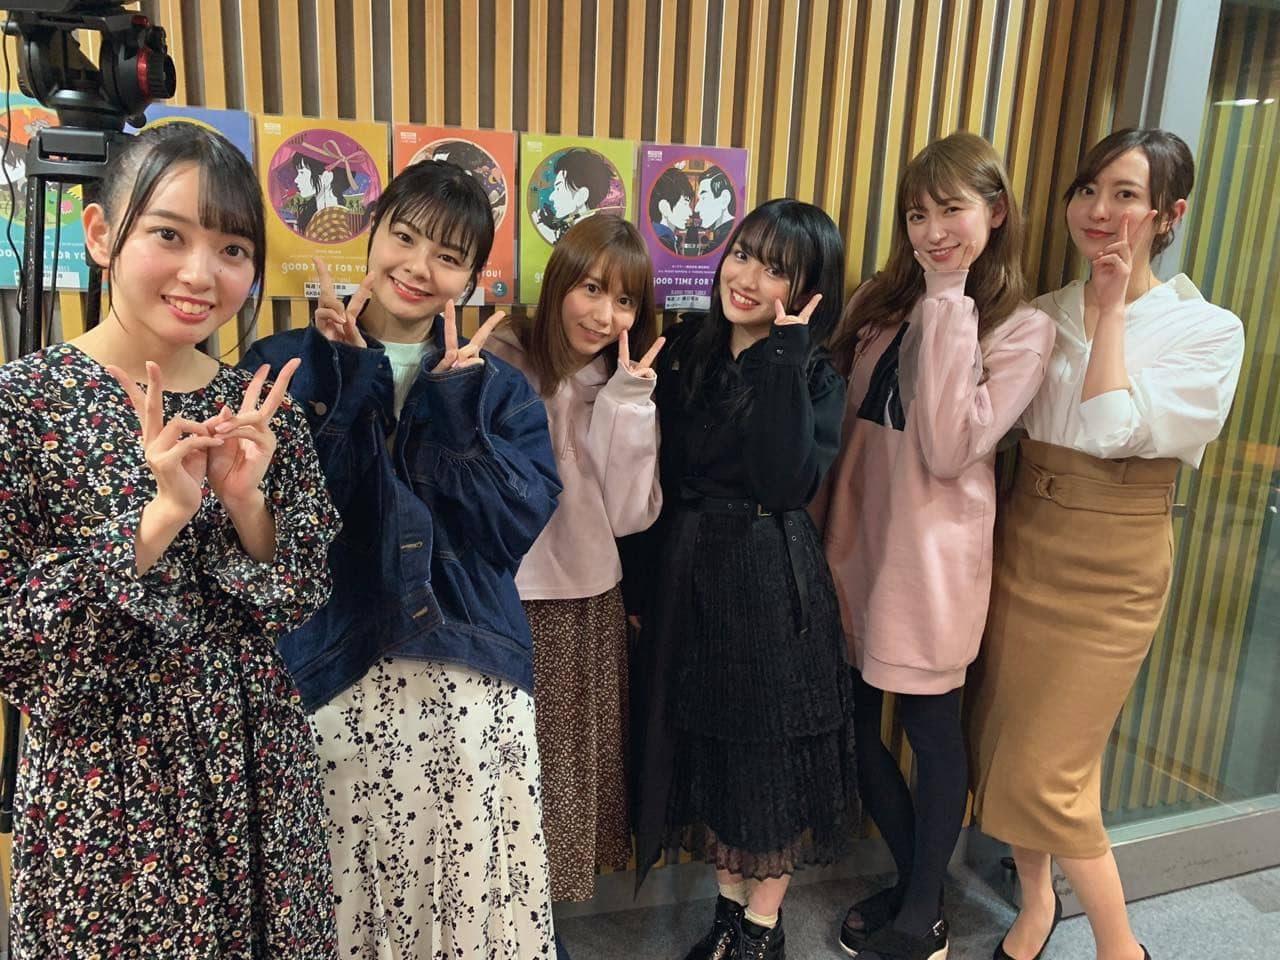 「AKB48のオールナイトニッポン」オフショット * 向井地美音・森保まどか・石田みなみ・吉田朱里・大場美奈・本間日陽